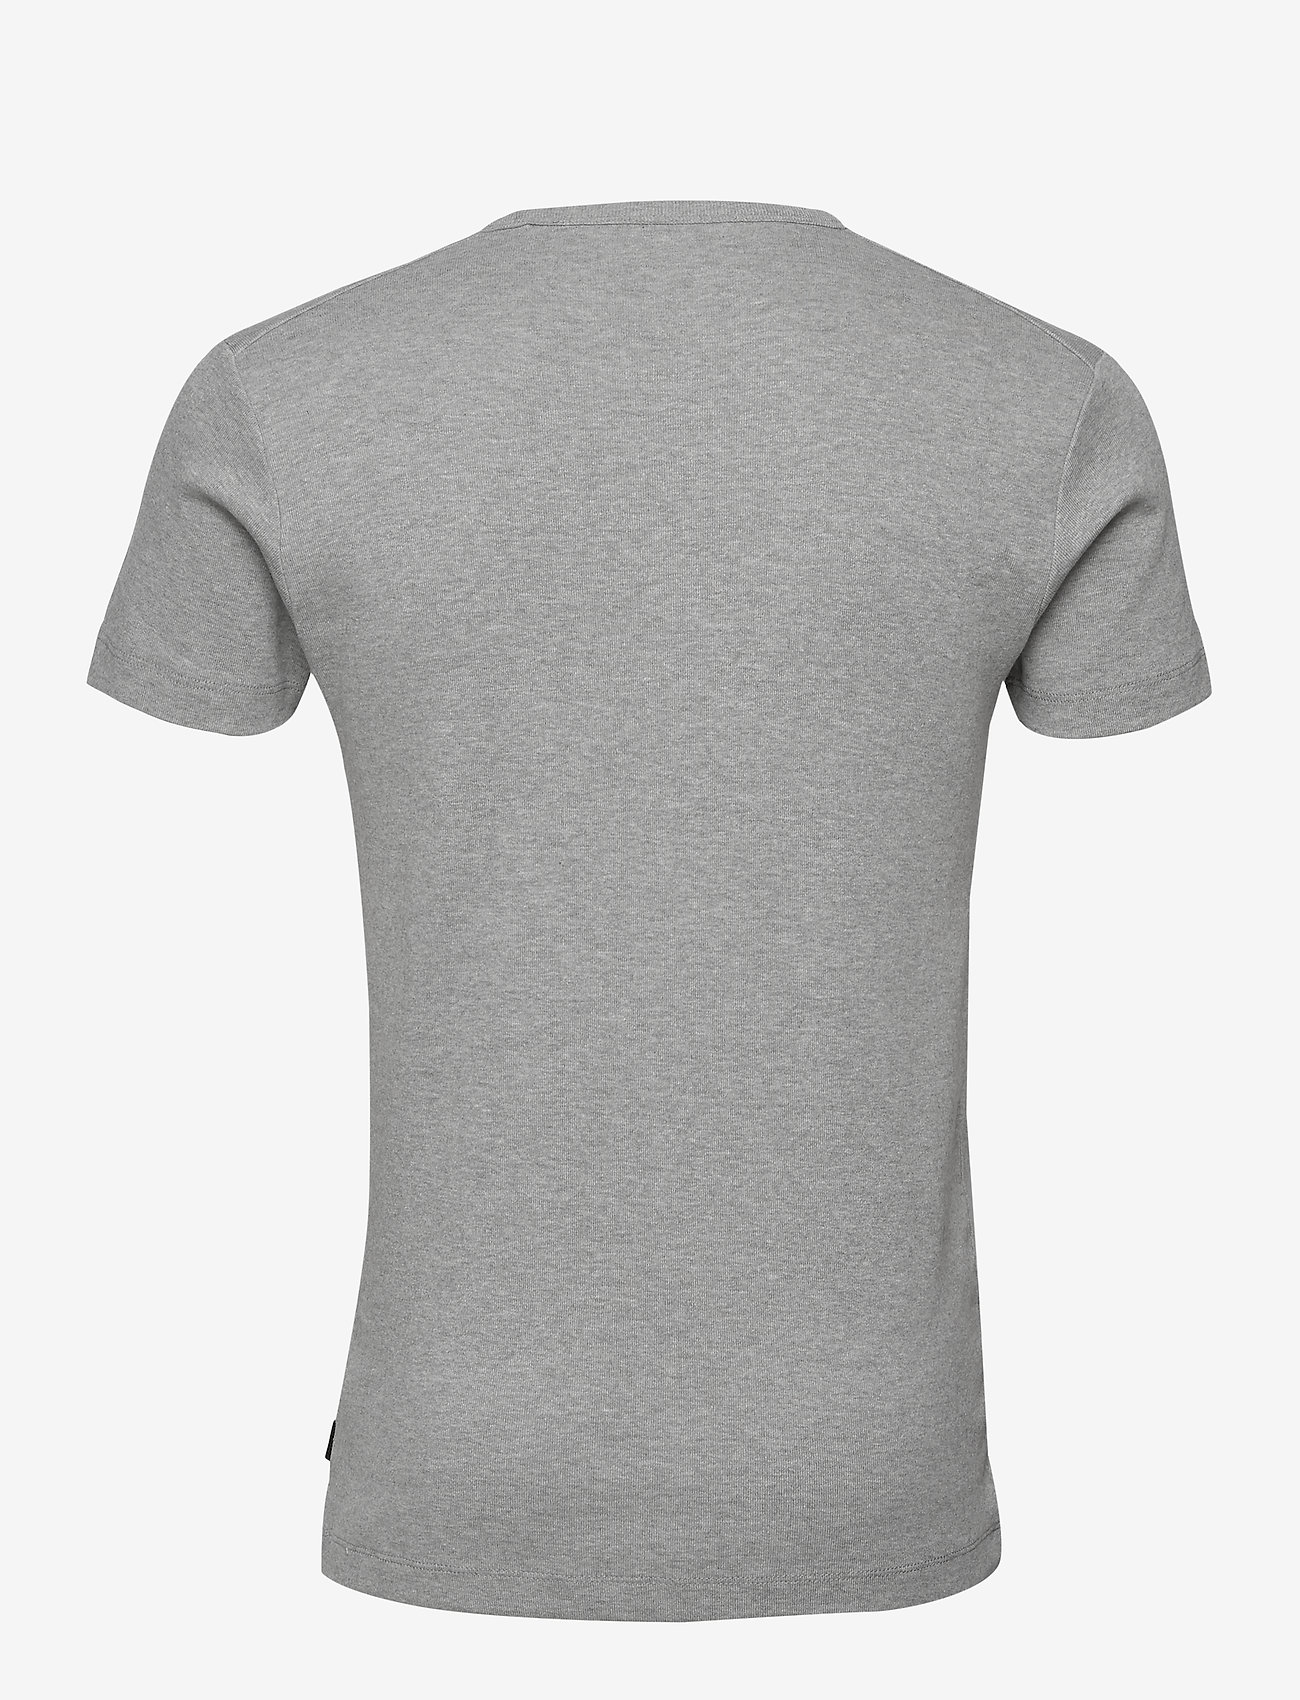 Esprit Casual T-Shirts - T-skjorter MEDIUM GREY 5 - Menn Klær